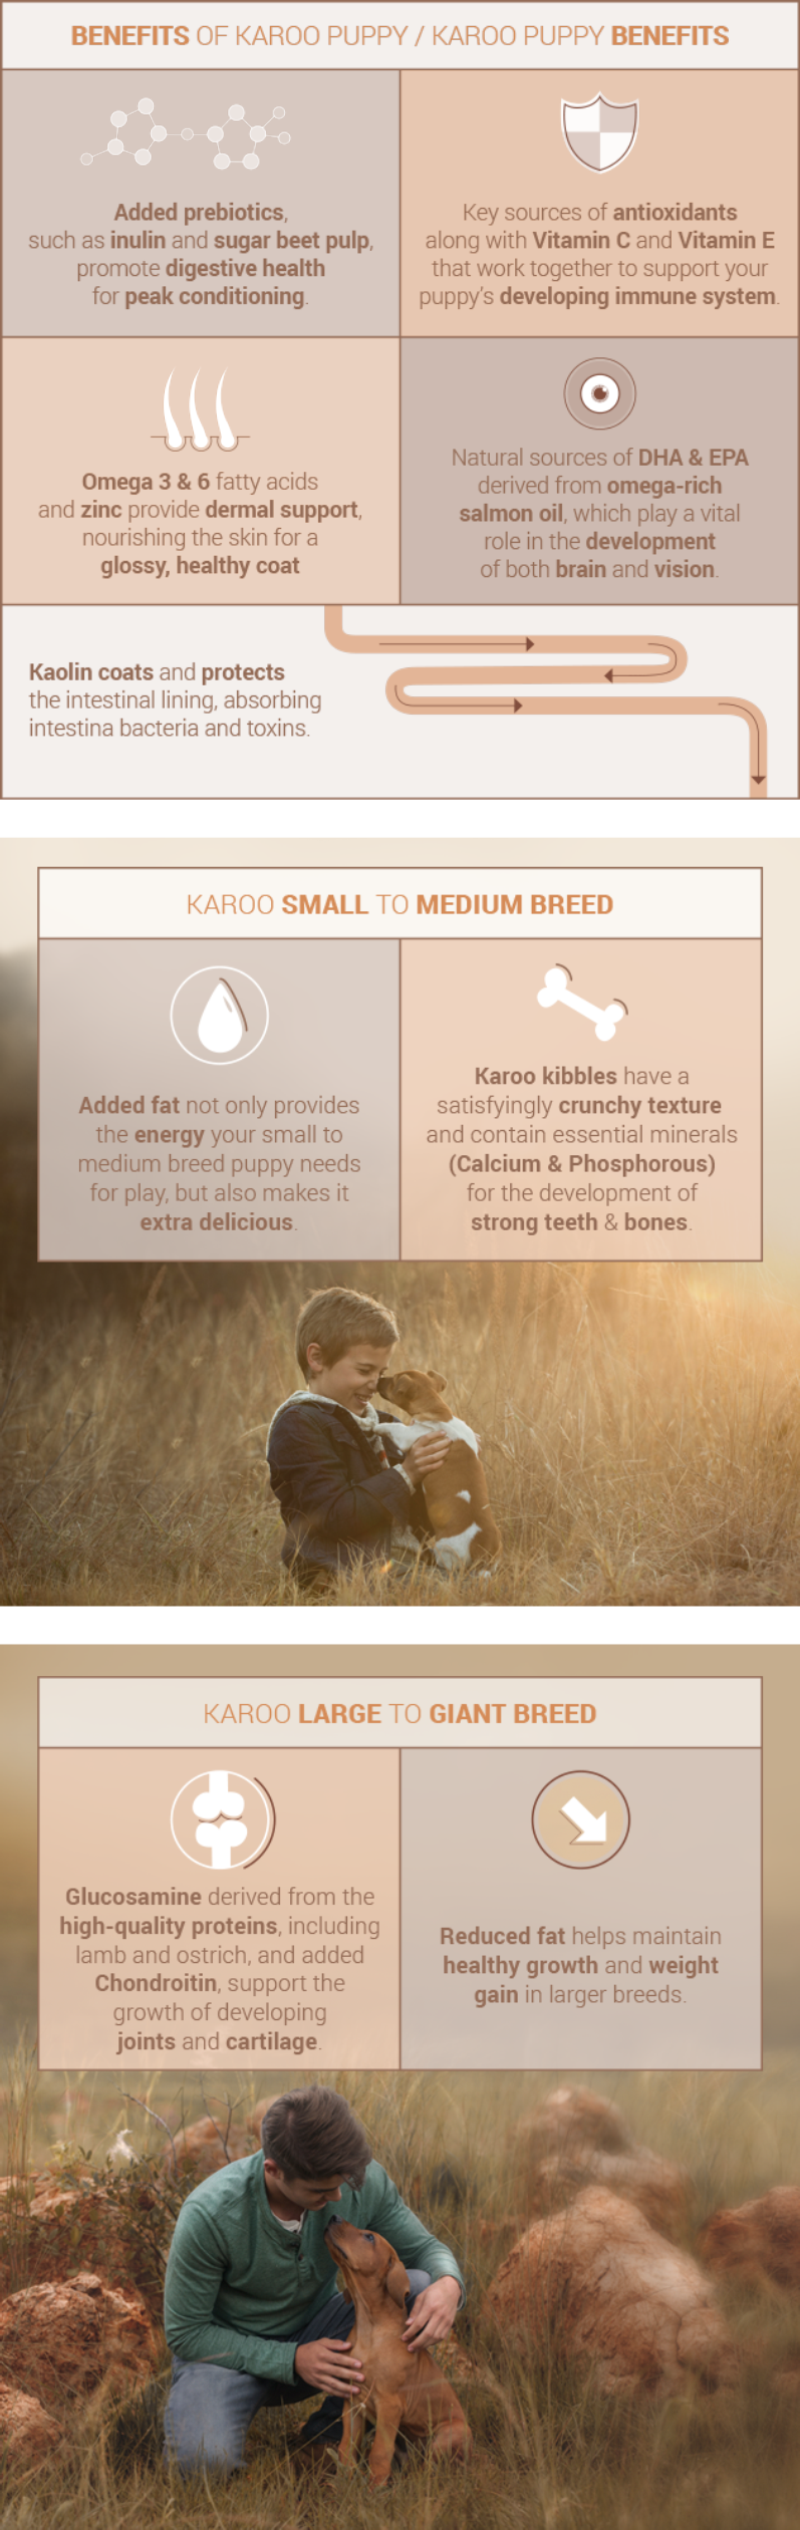 Benefits of Karoo Puppy